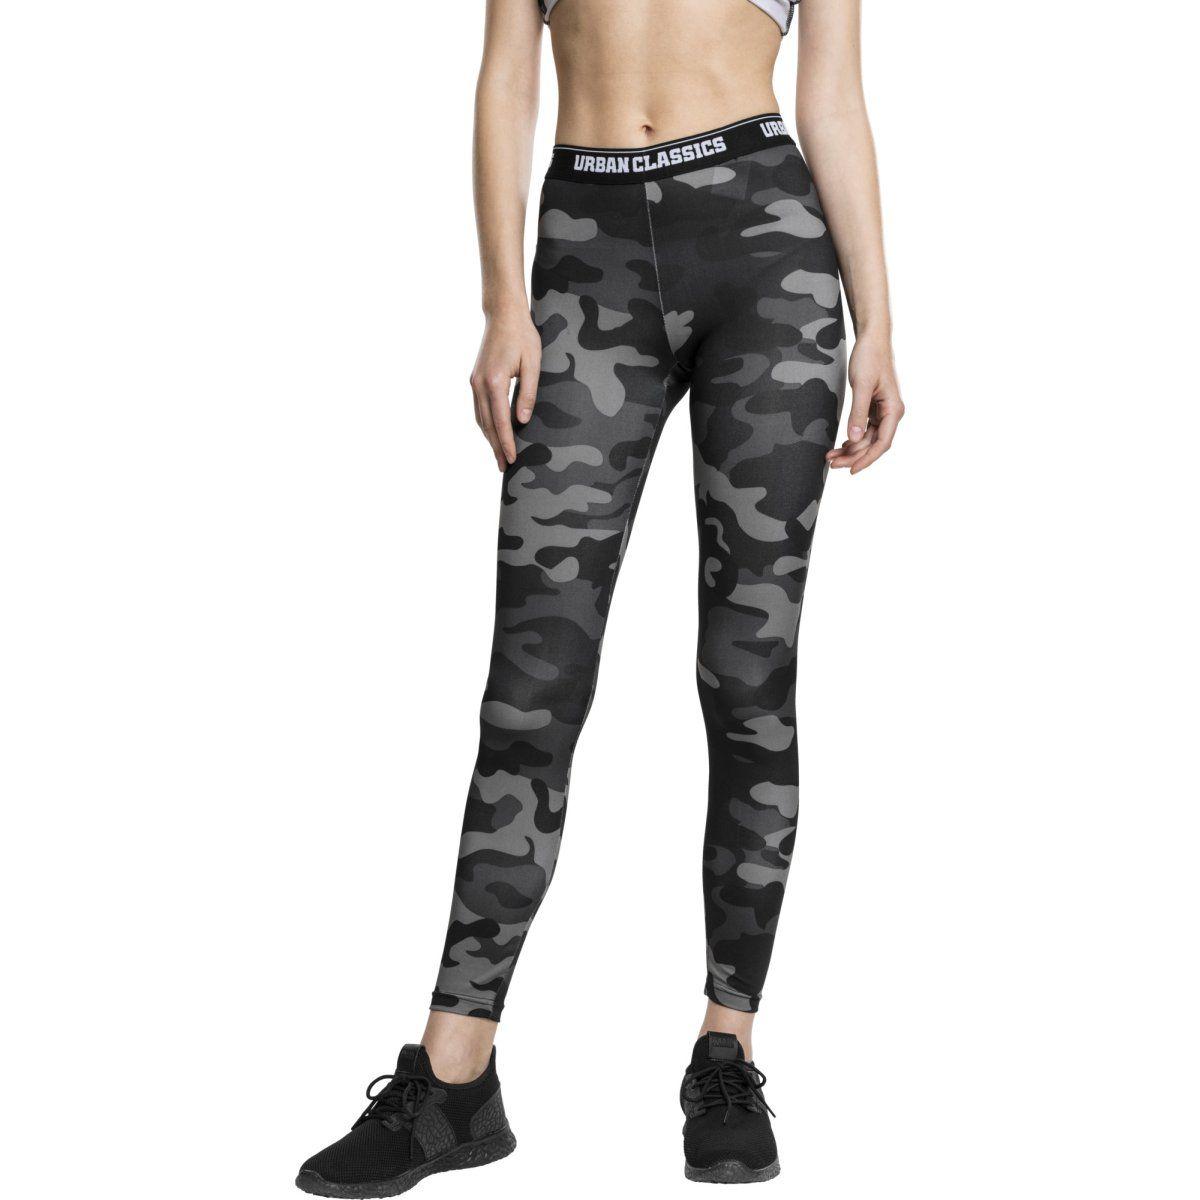 Urban Classics Ladies - SPORT Fitness Stretch Sport Leggings